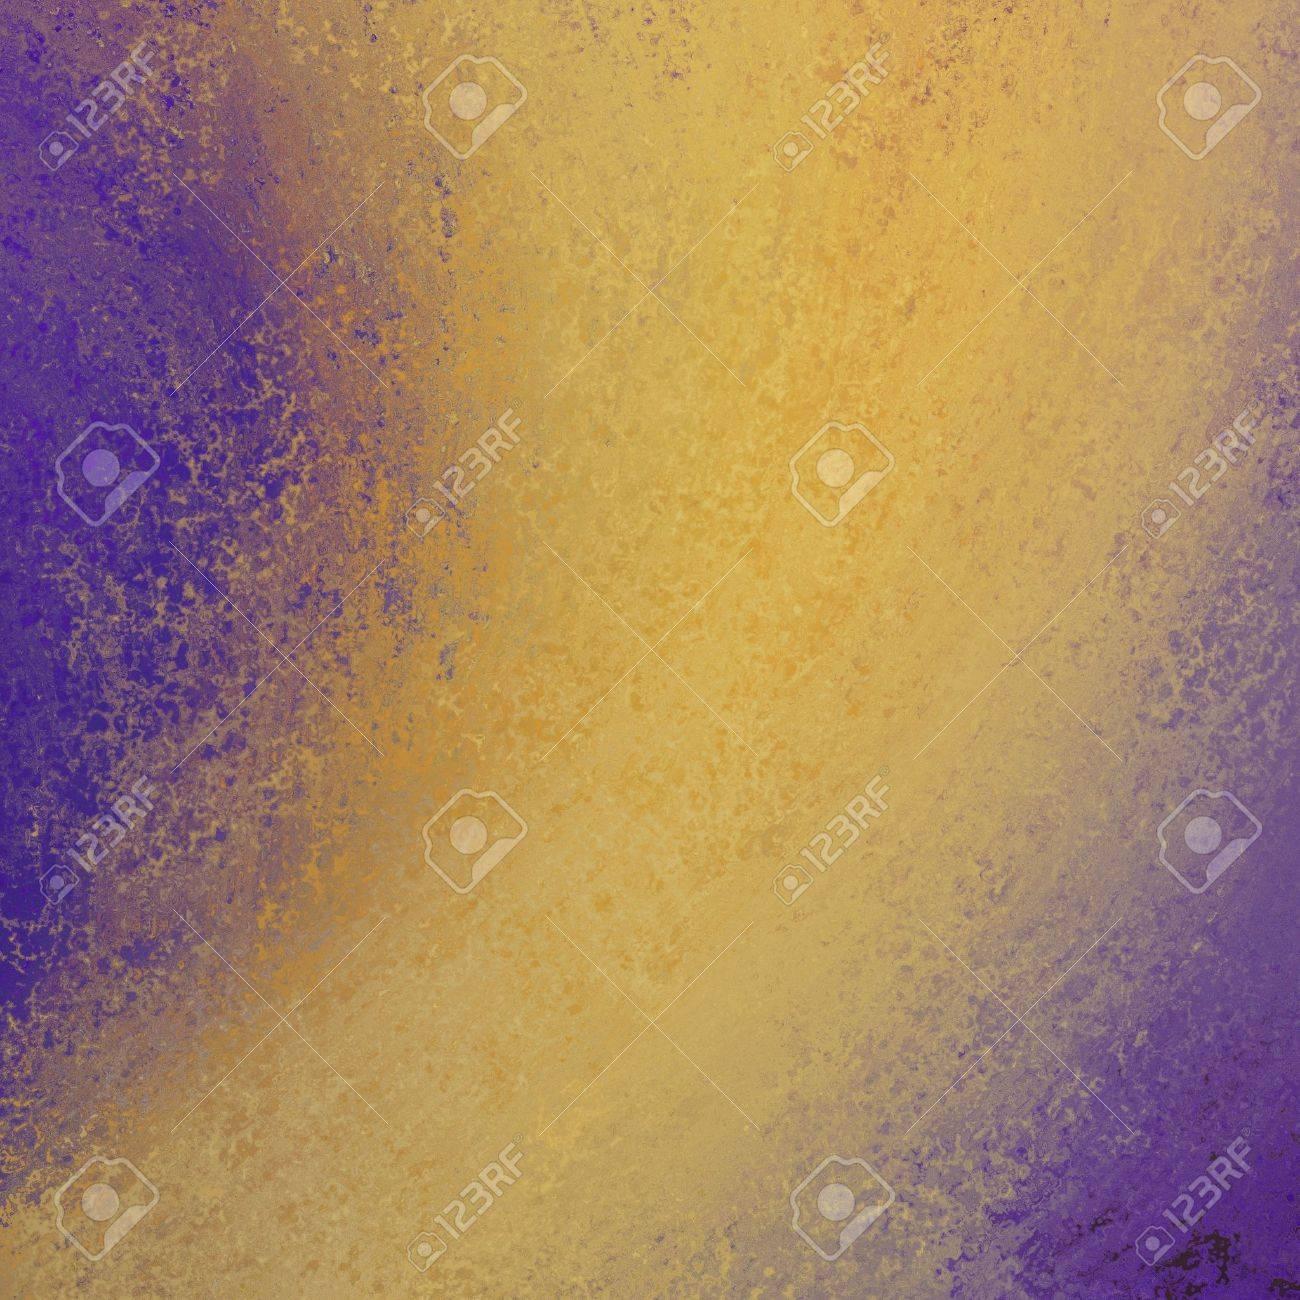 purple gold background. gold design element. gold color splash on purple background. shiny gold streak abstract design. - 41315197